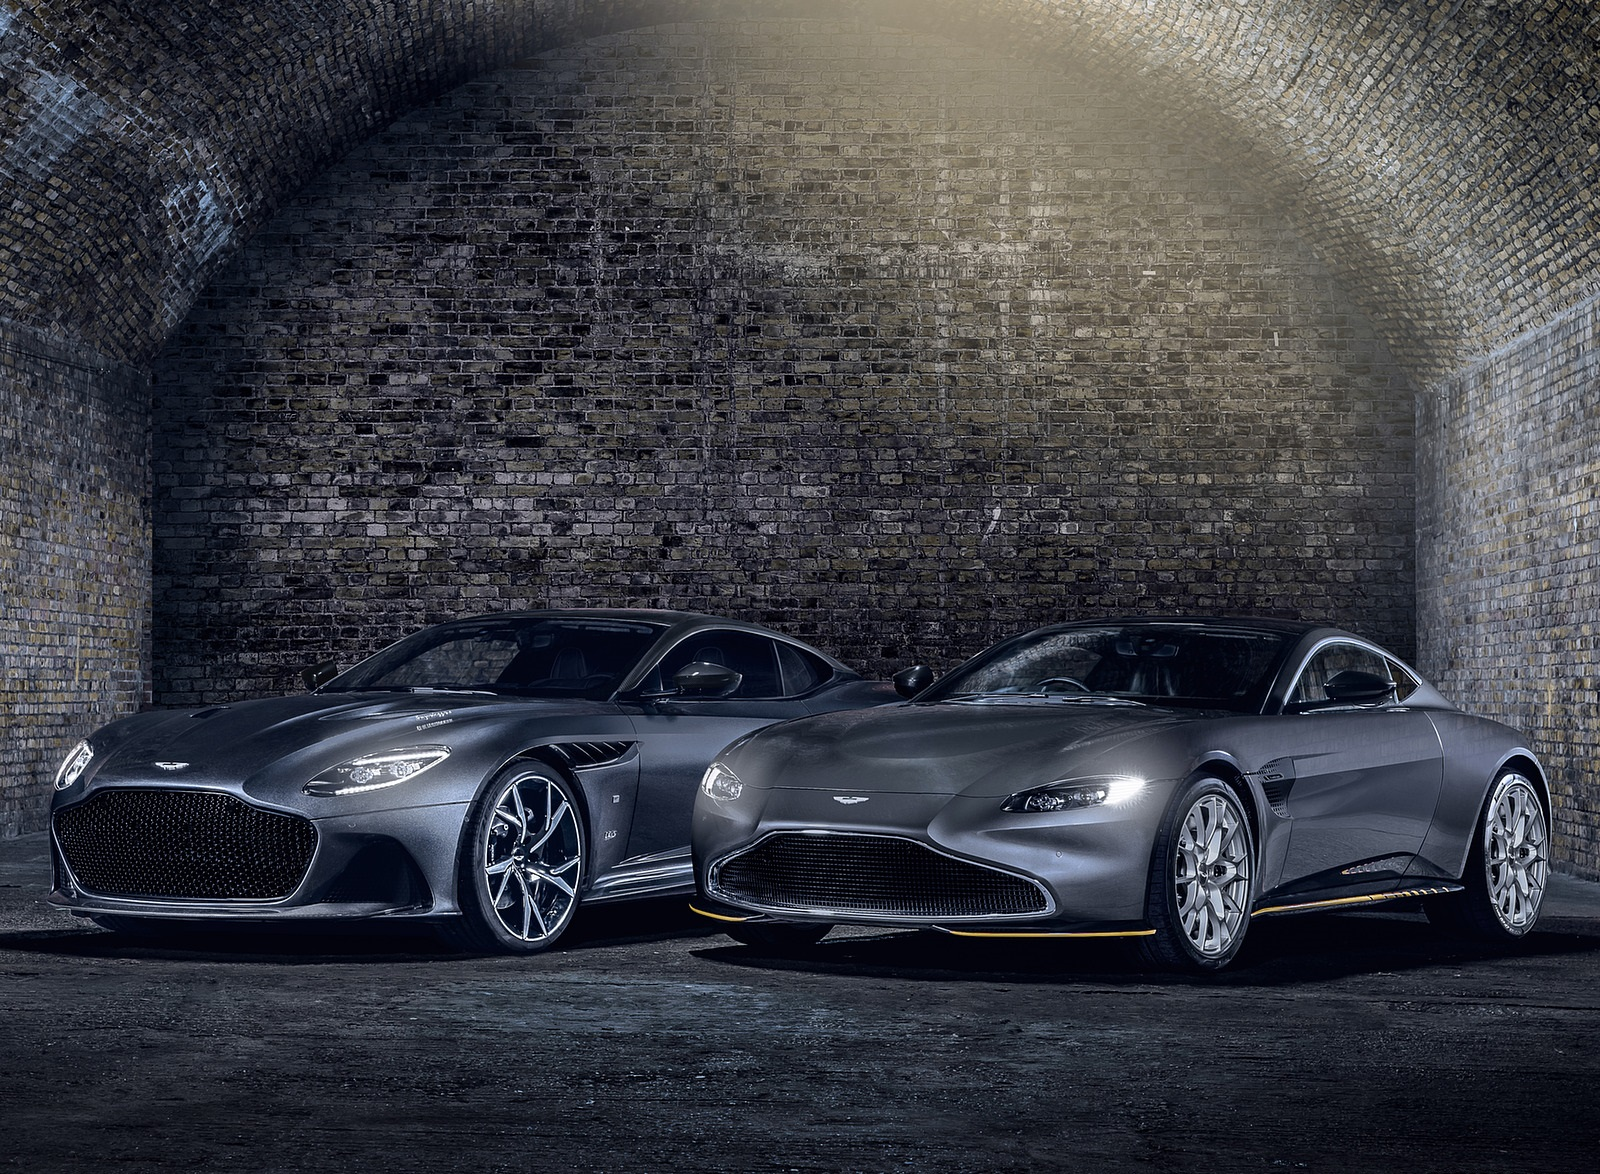 2021 Aston Martin Vantage 007 Edition and DBS Superleggera 007 Edition Wallpapers (6)